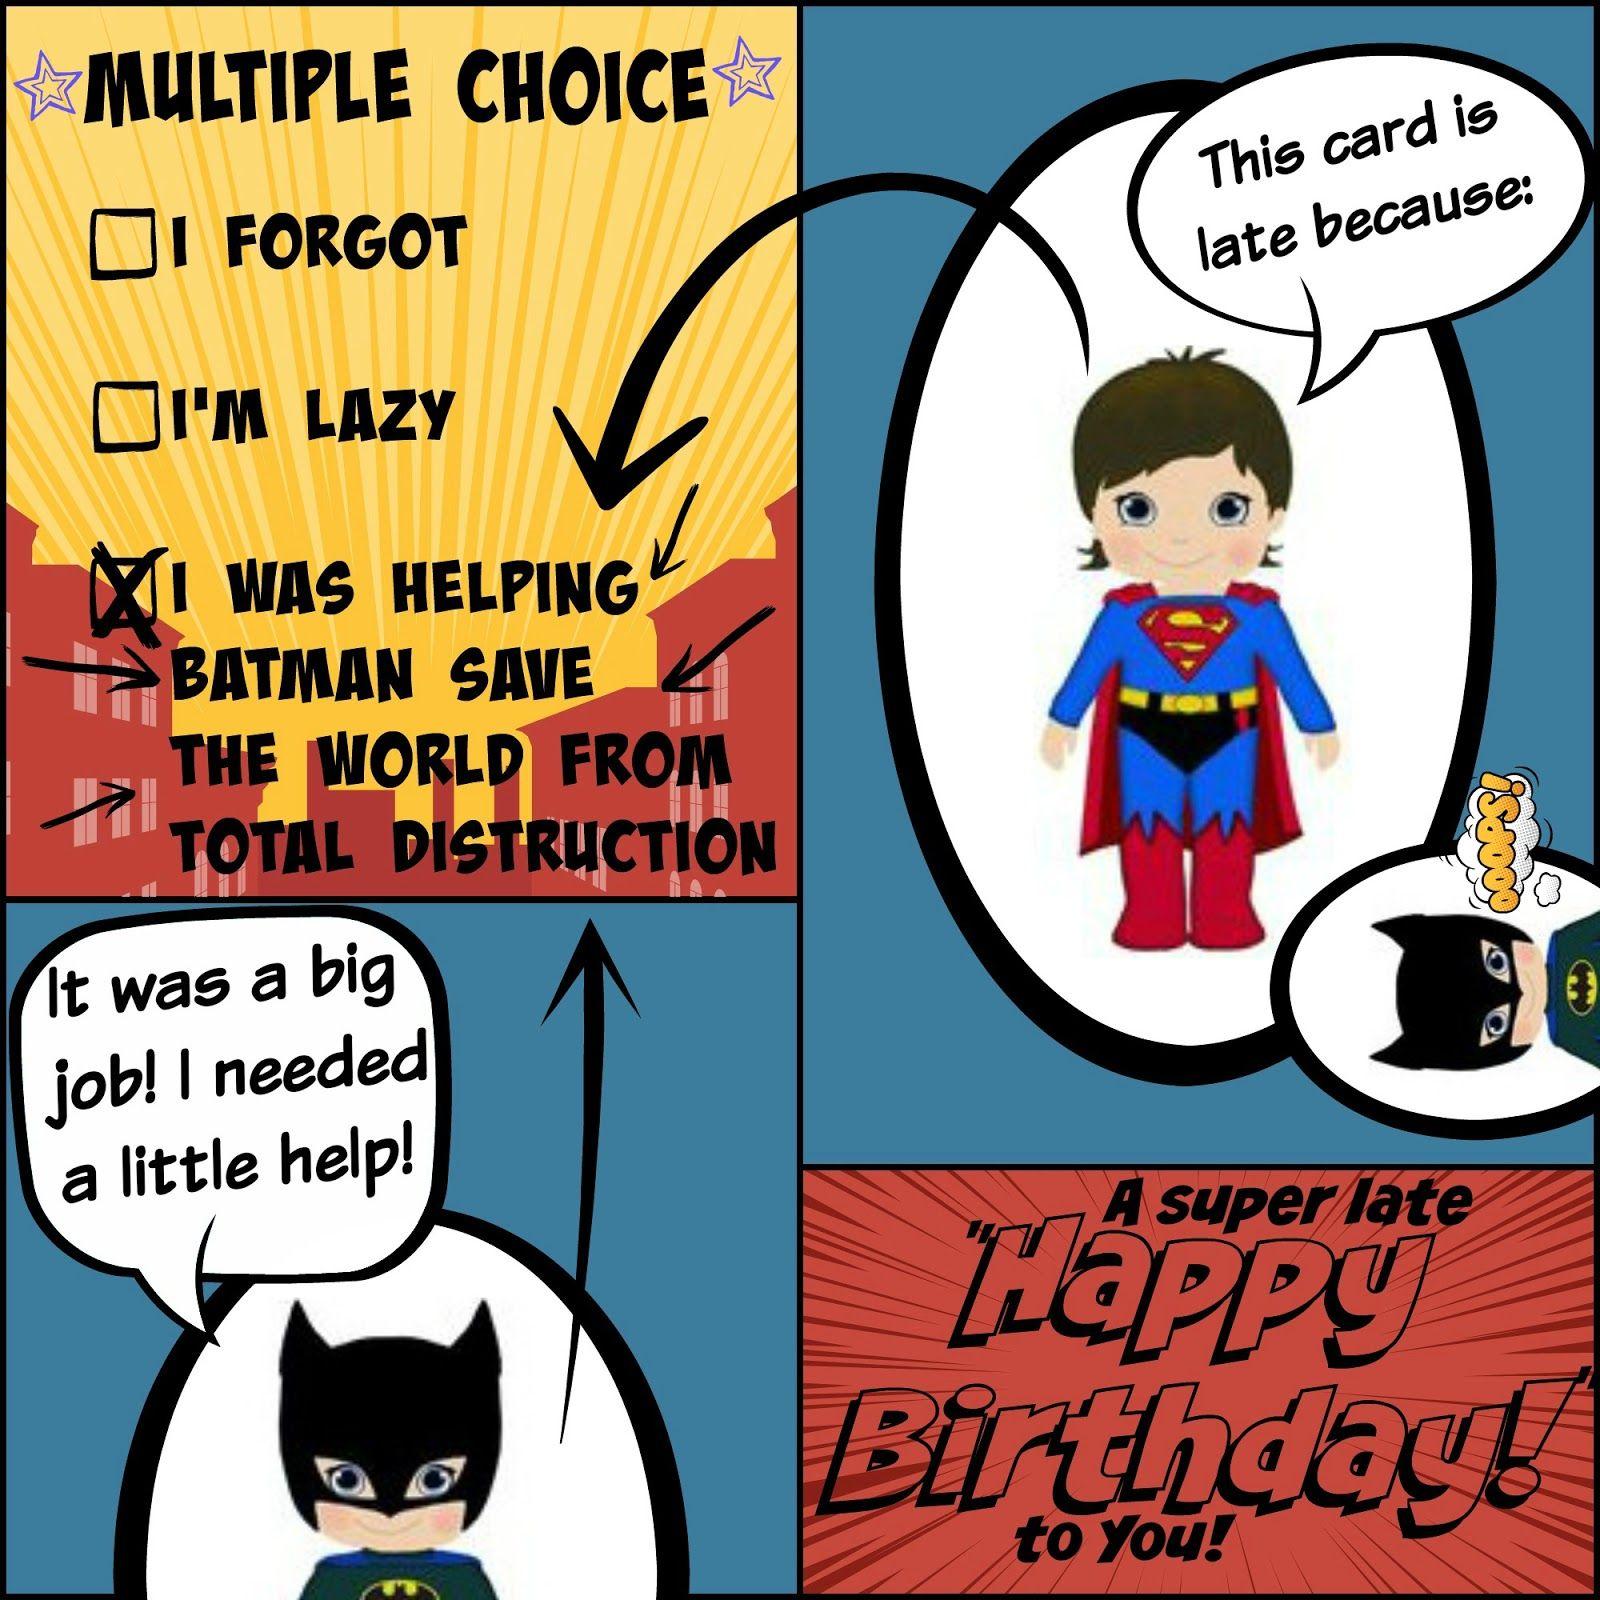 Happy Belated Birthday Printable Card